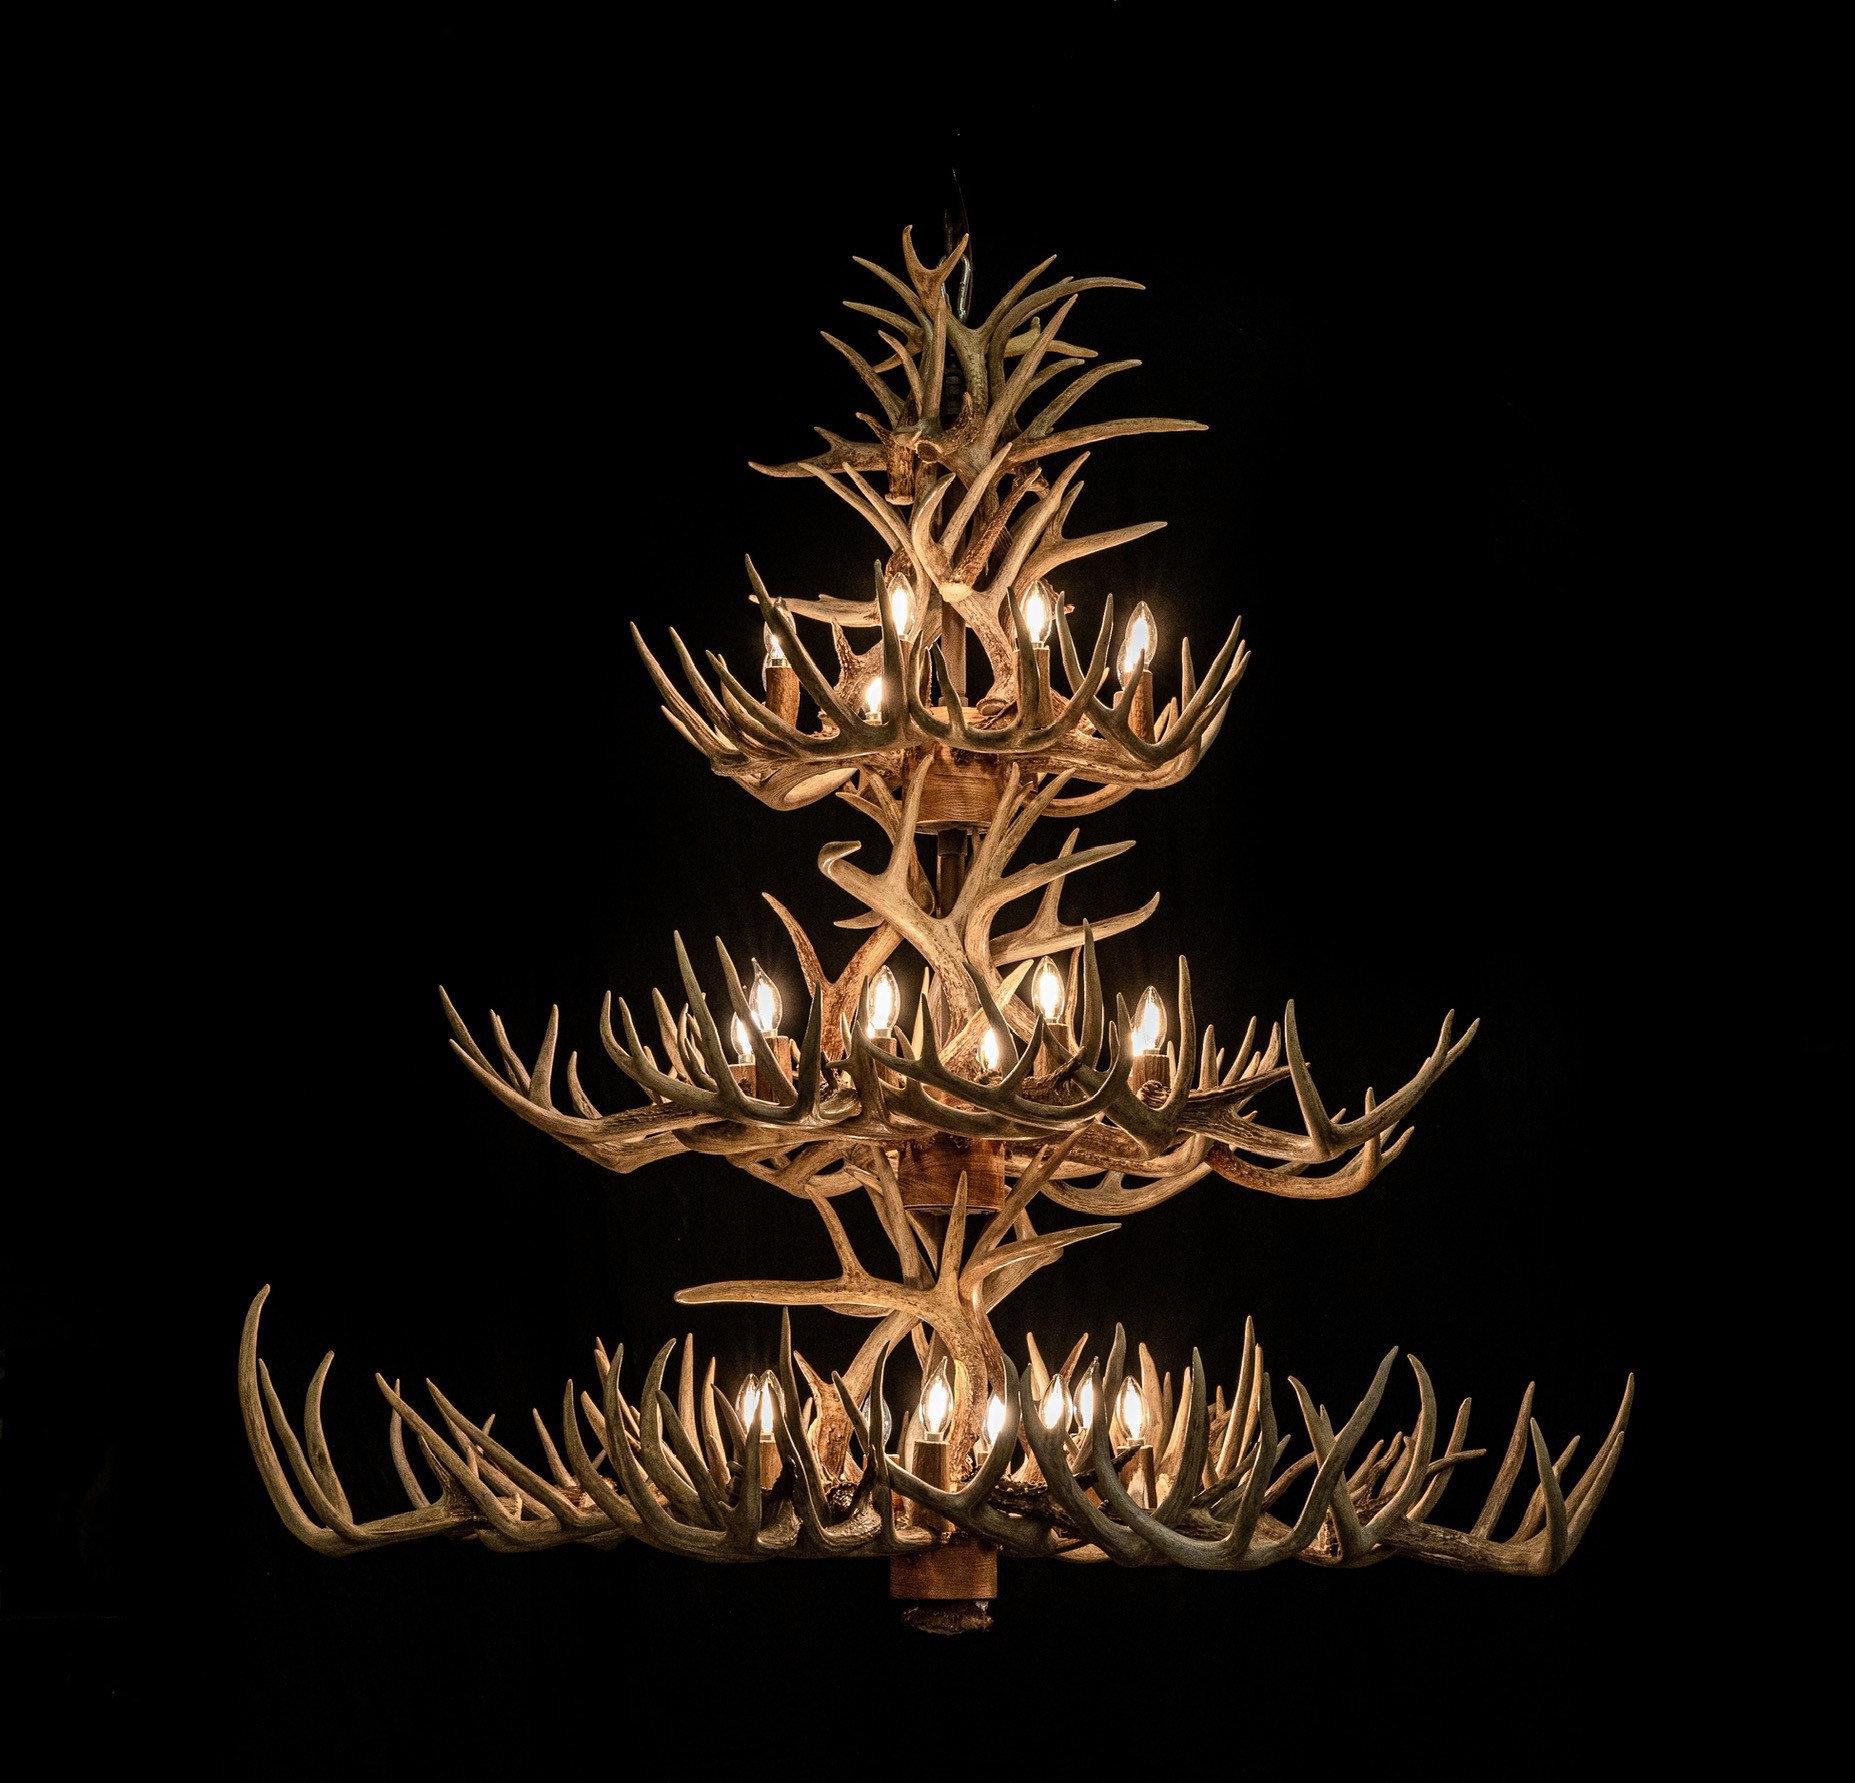 Large Whitetail Deer Antler 3 tier chandelier 68 antlers 24 lights - NEW LISTING!